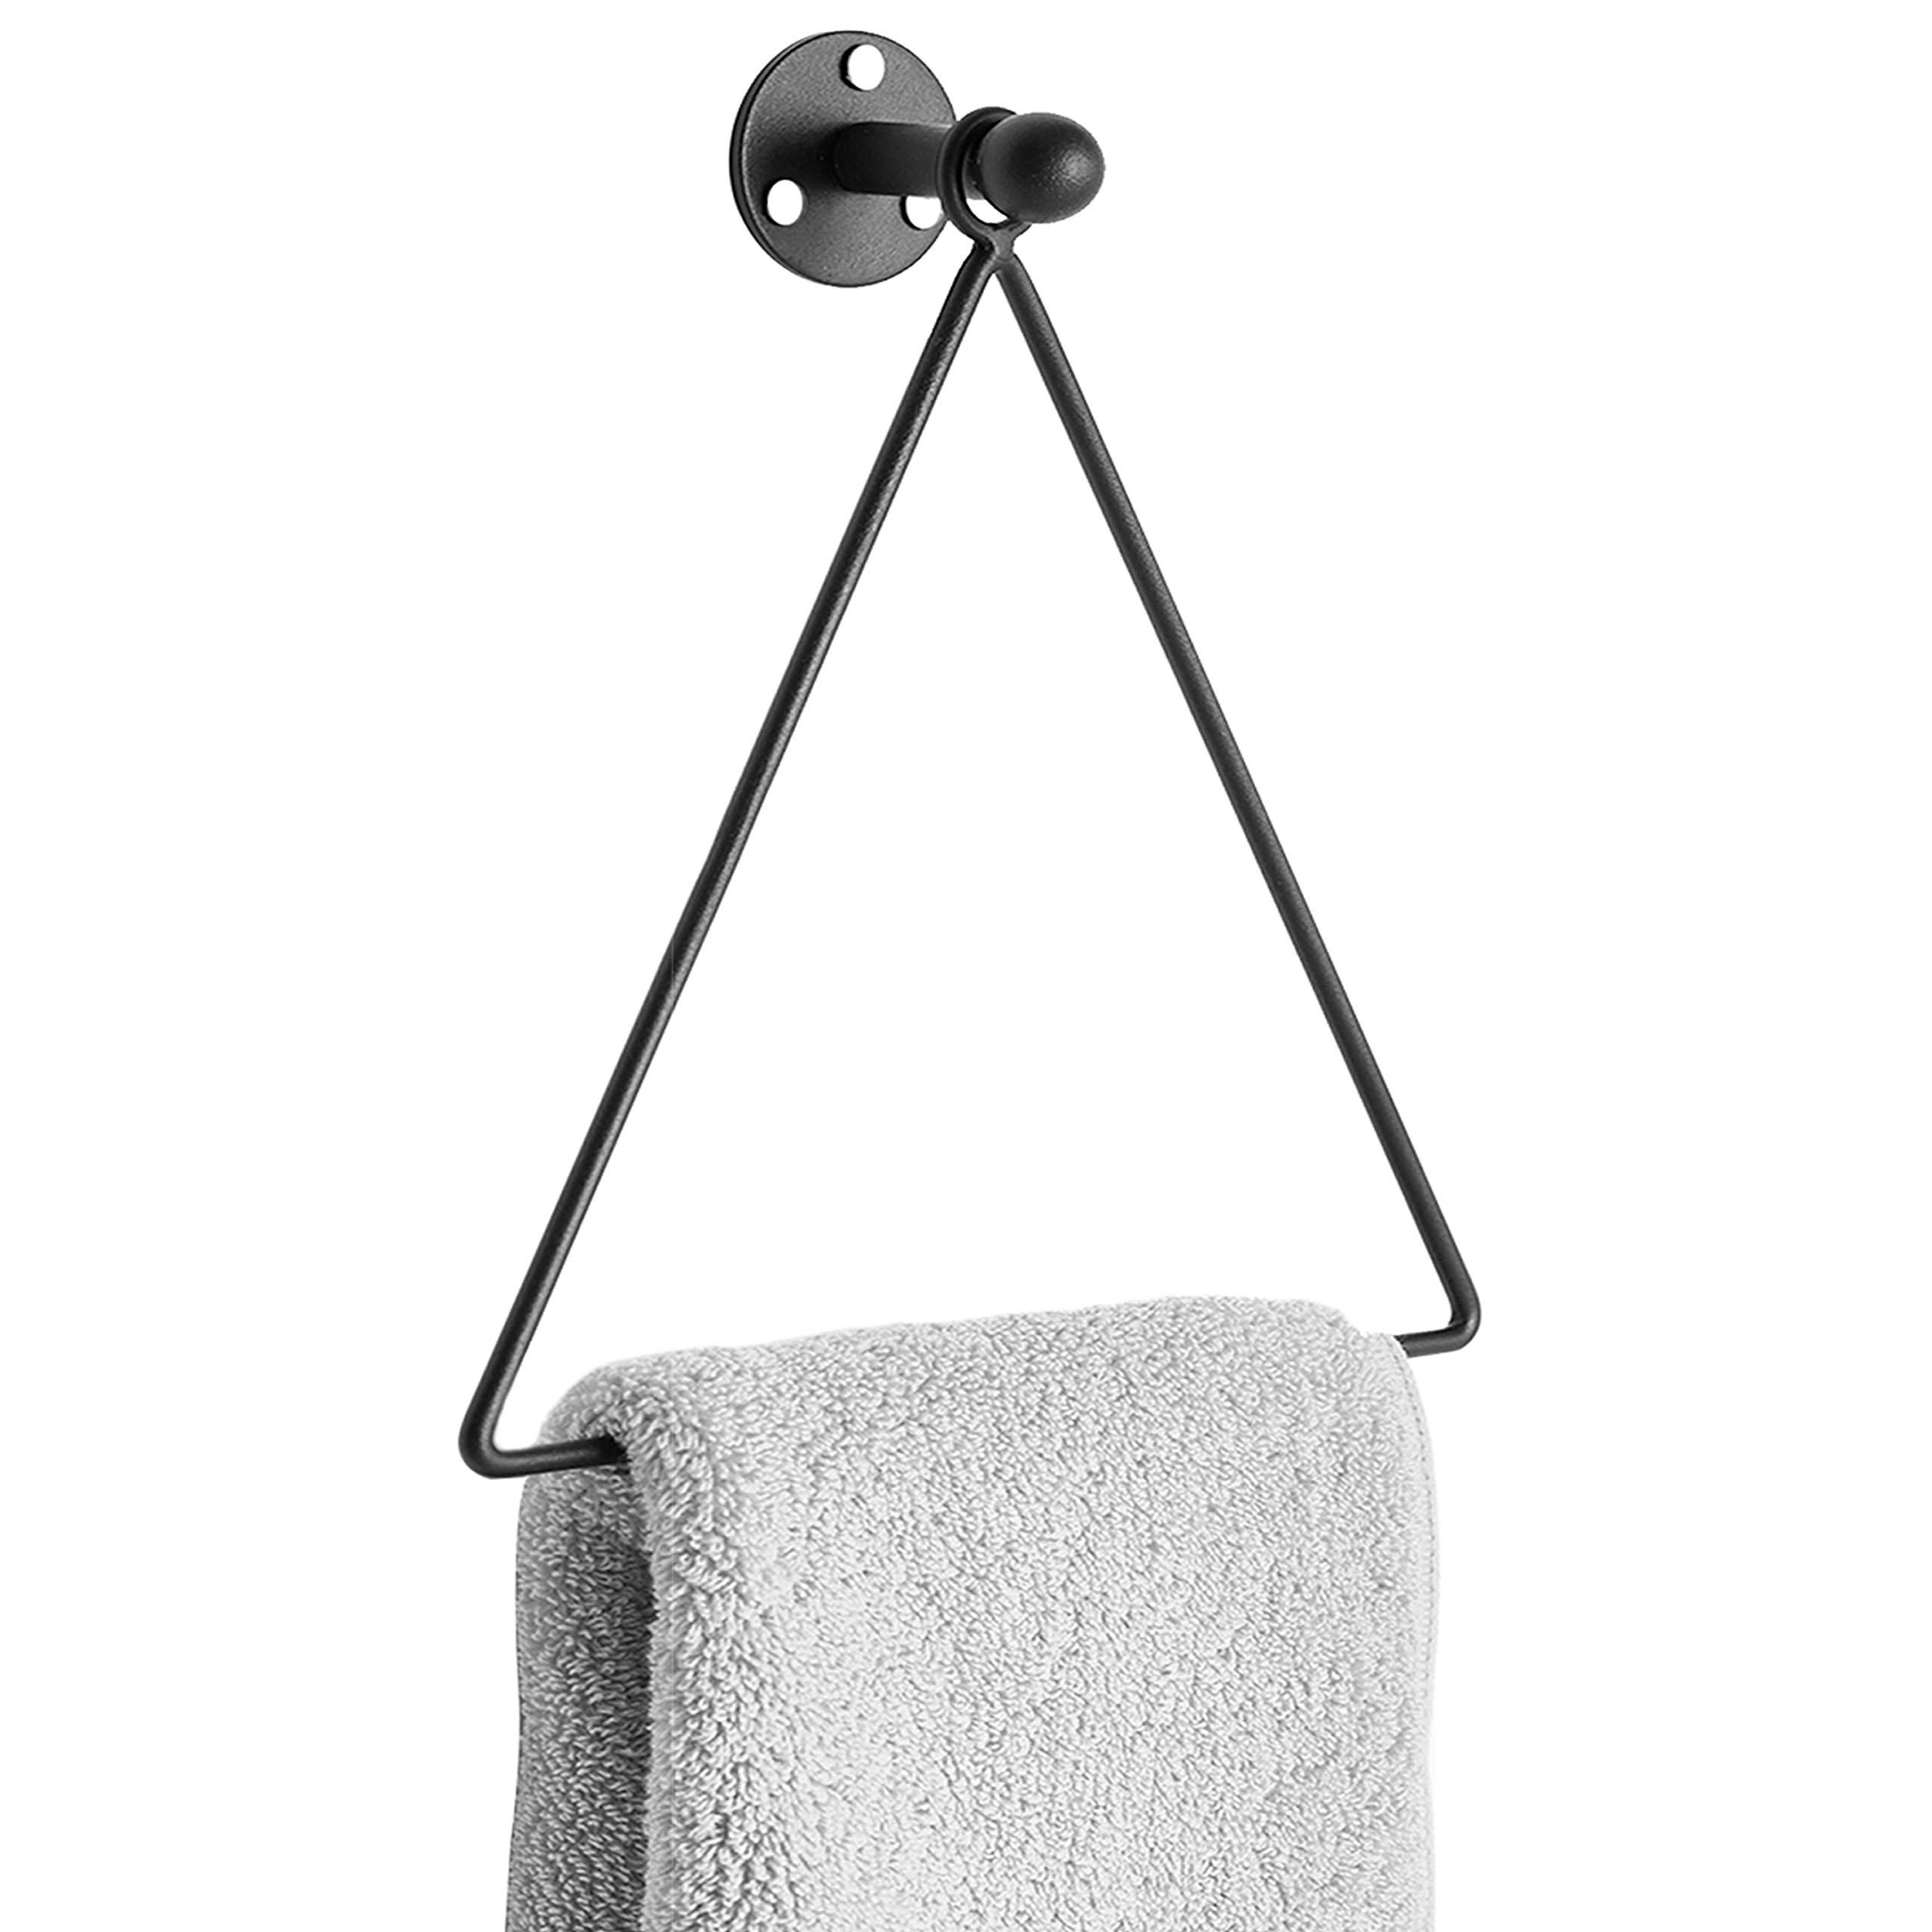 Modern Wall Mounted Triangle Metal Bathroom Kitchen Hand Towel Bar Rack, Black by MyGift